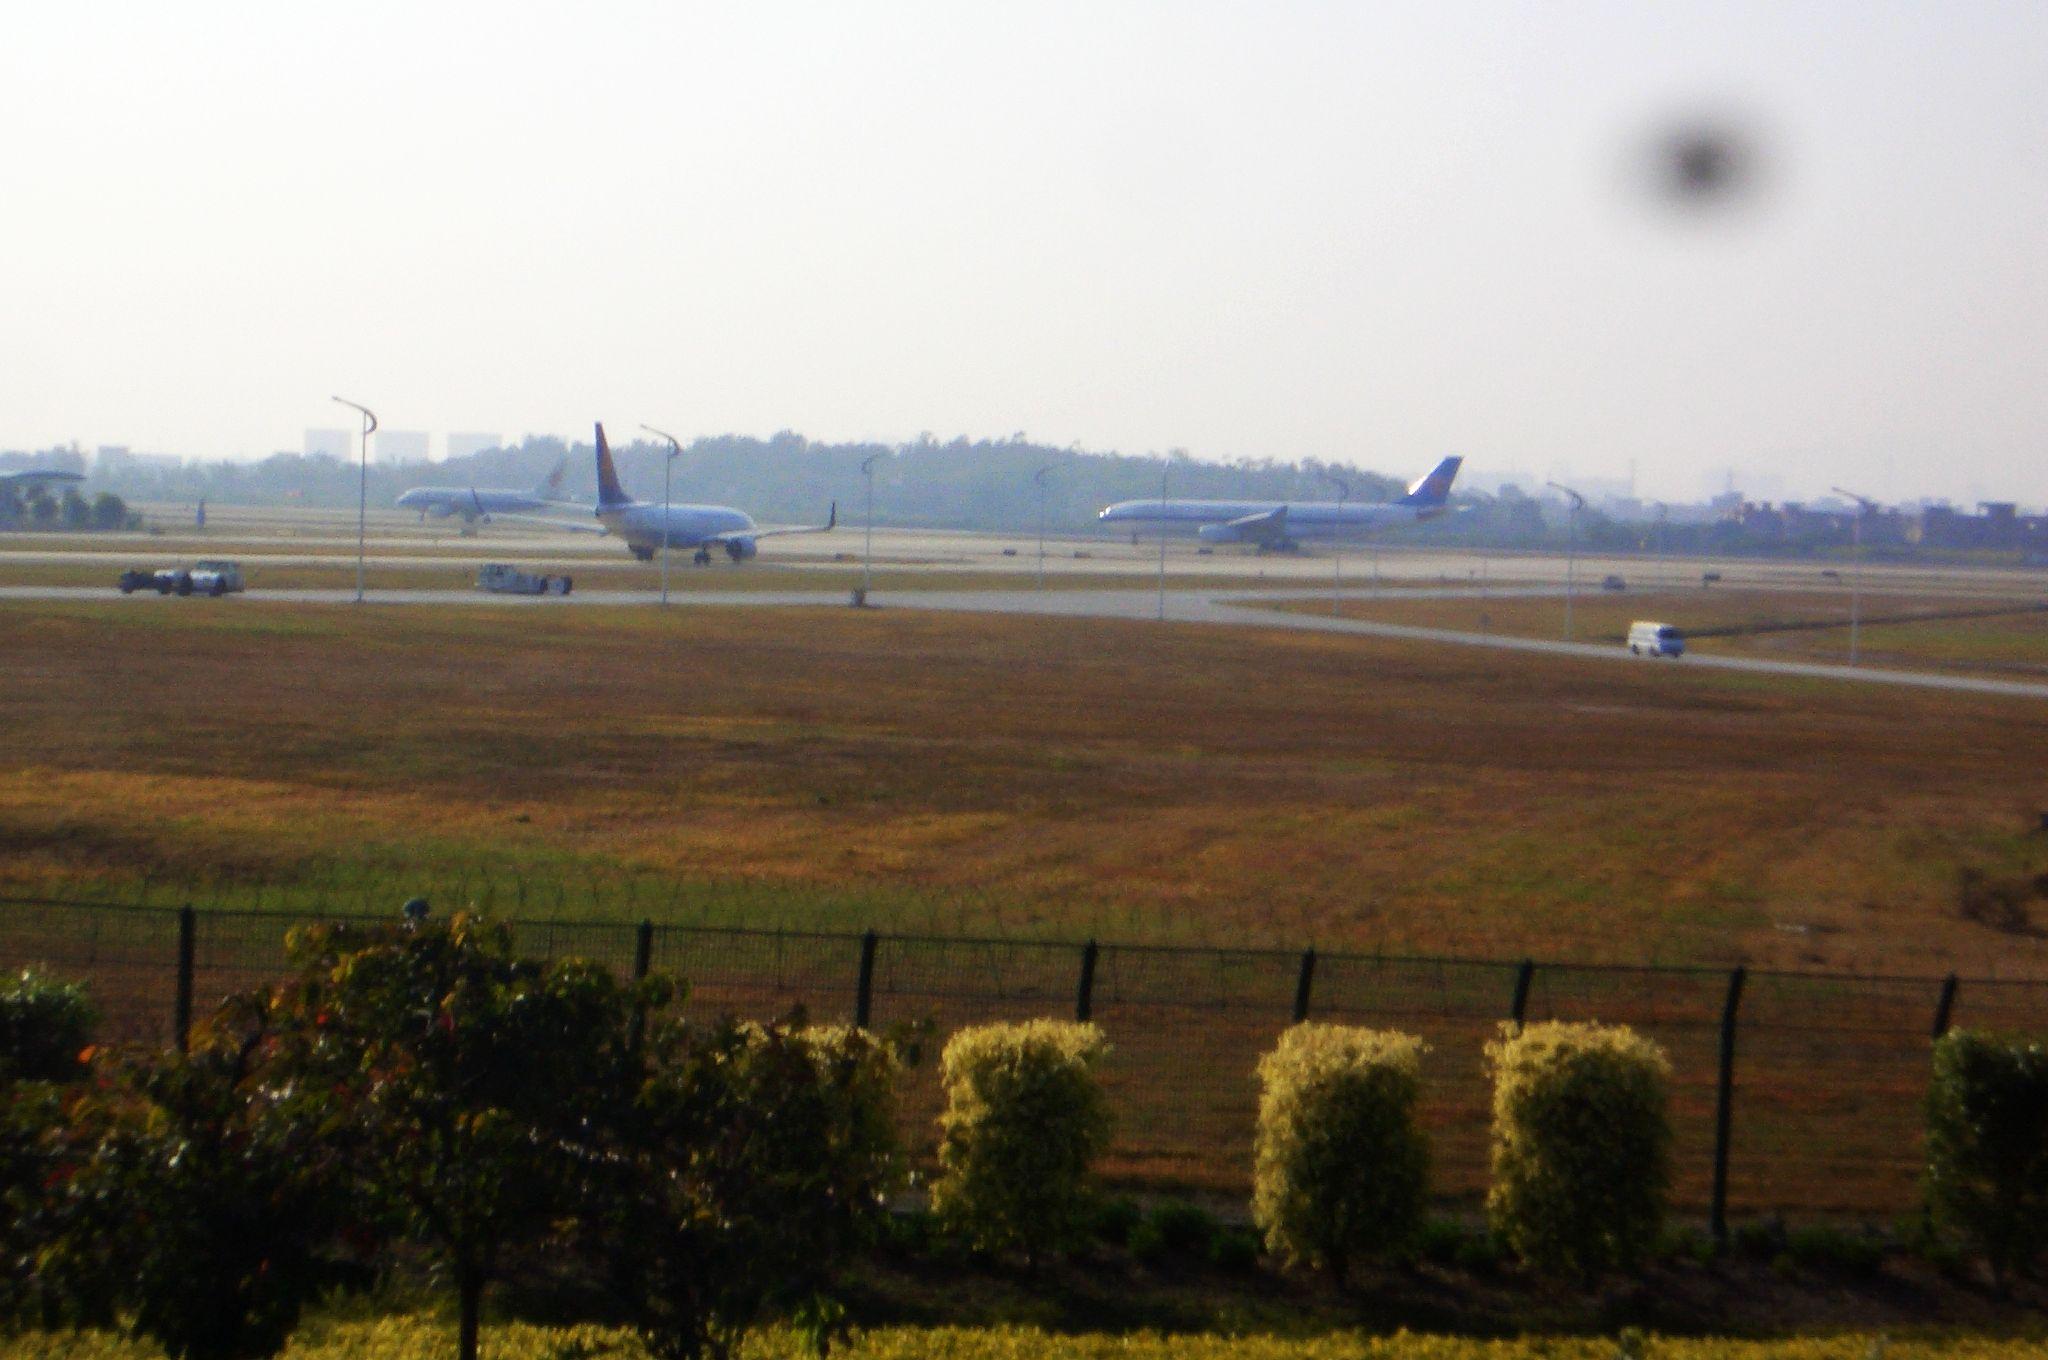 Re:[原创]恢复信心后的第一次发帖,09年第一次活动 AIRBUS A330-300  中国广州白云机场 中国广州白云机场